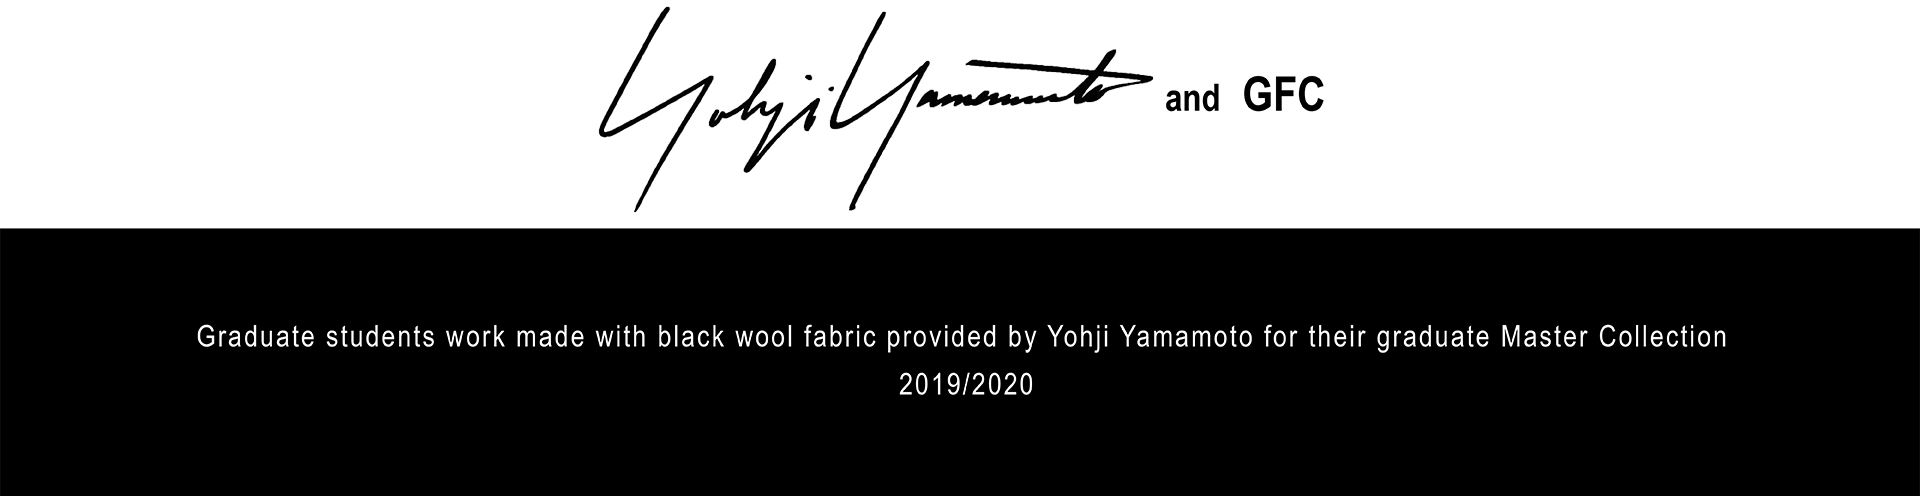 yohji and GFC 2019